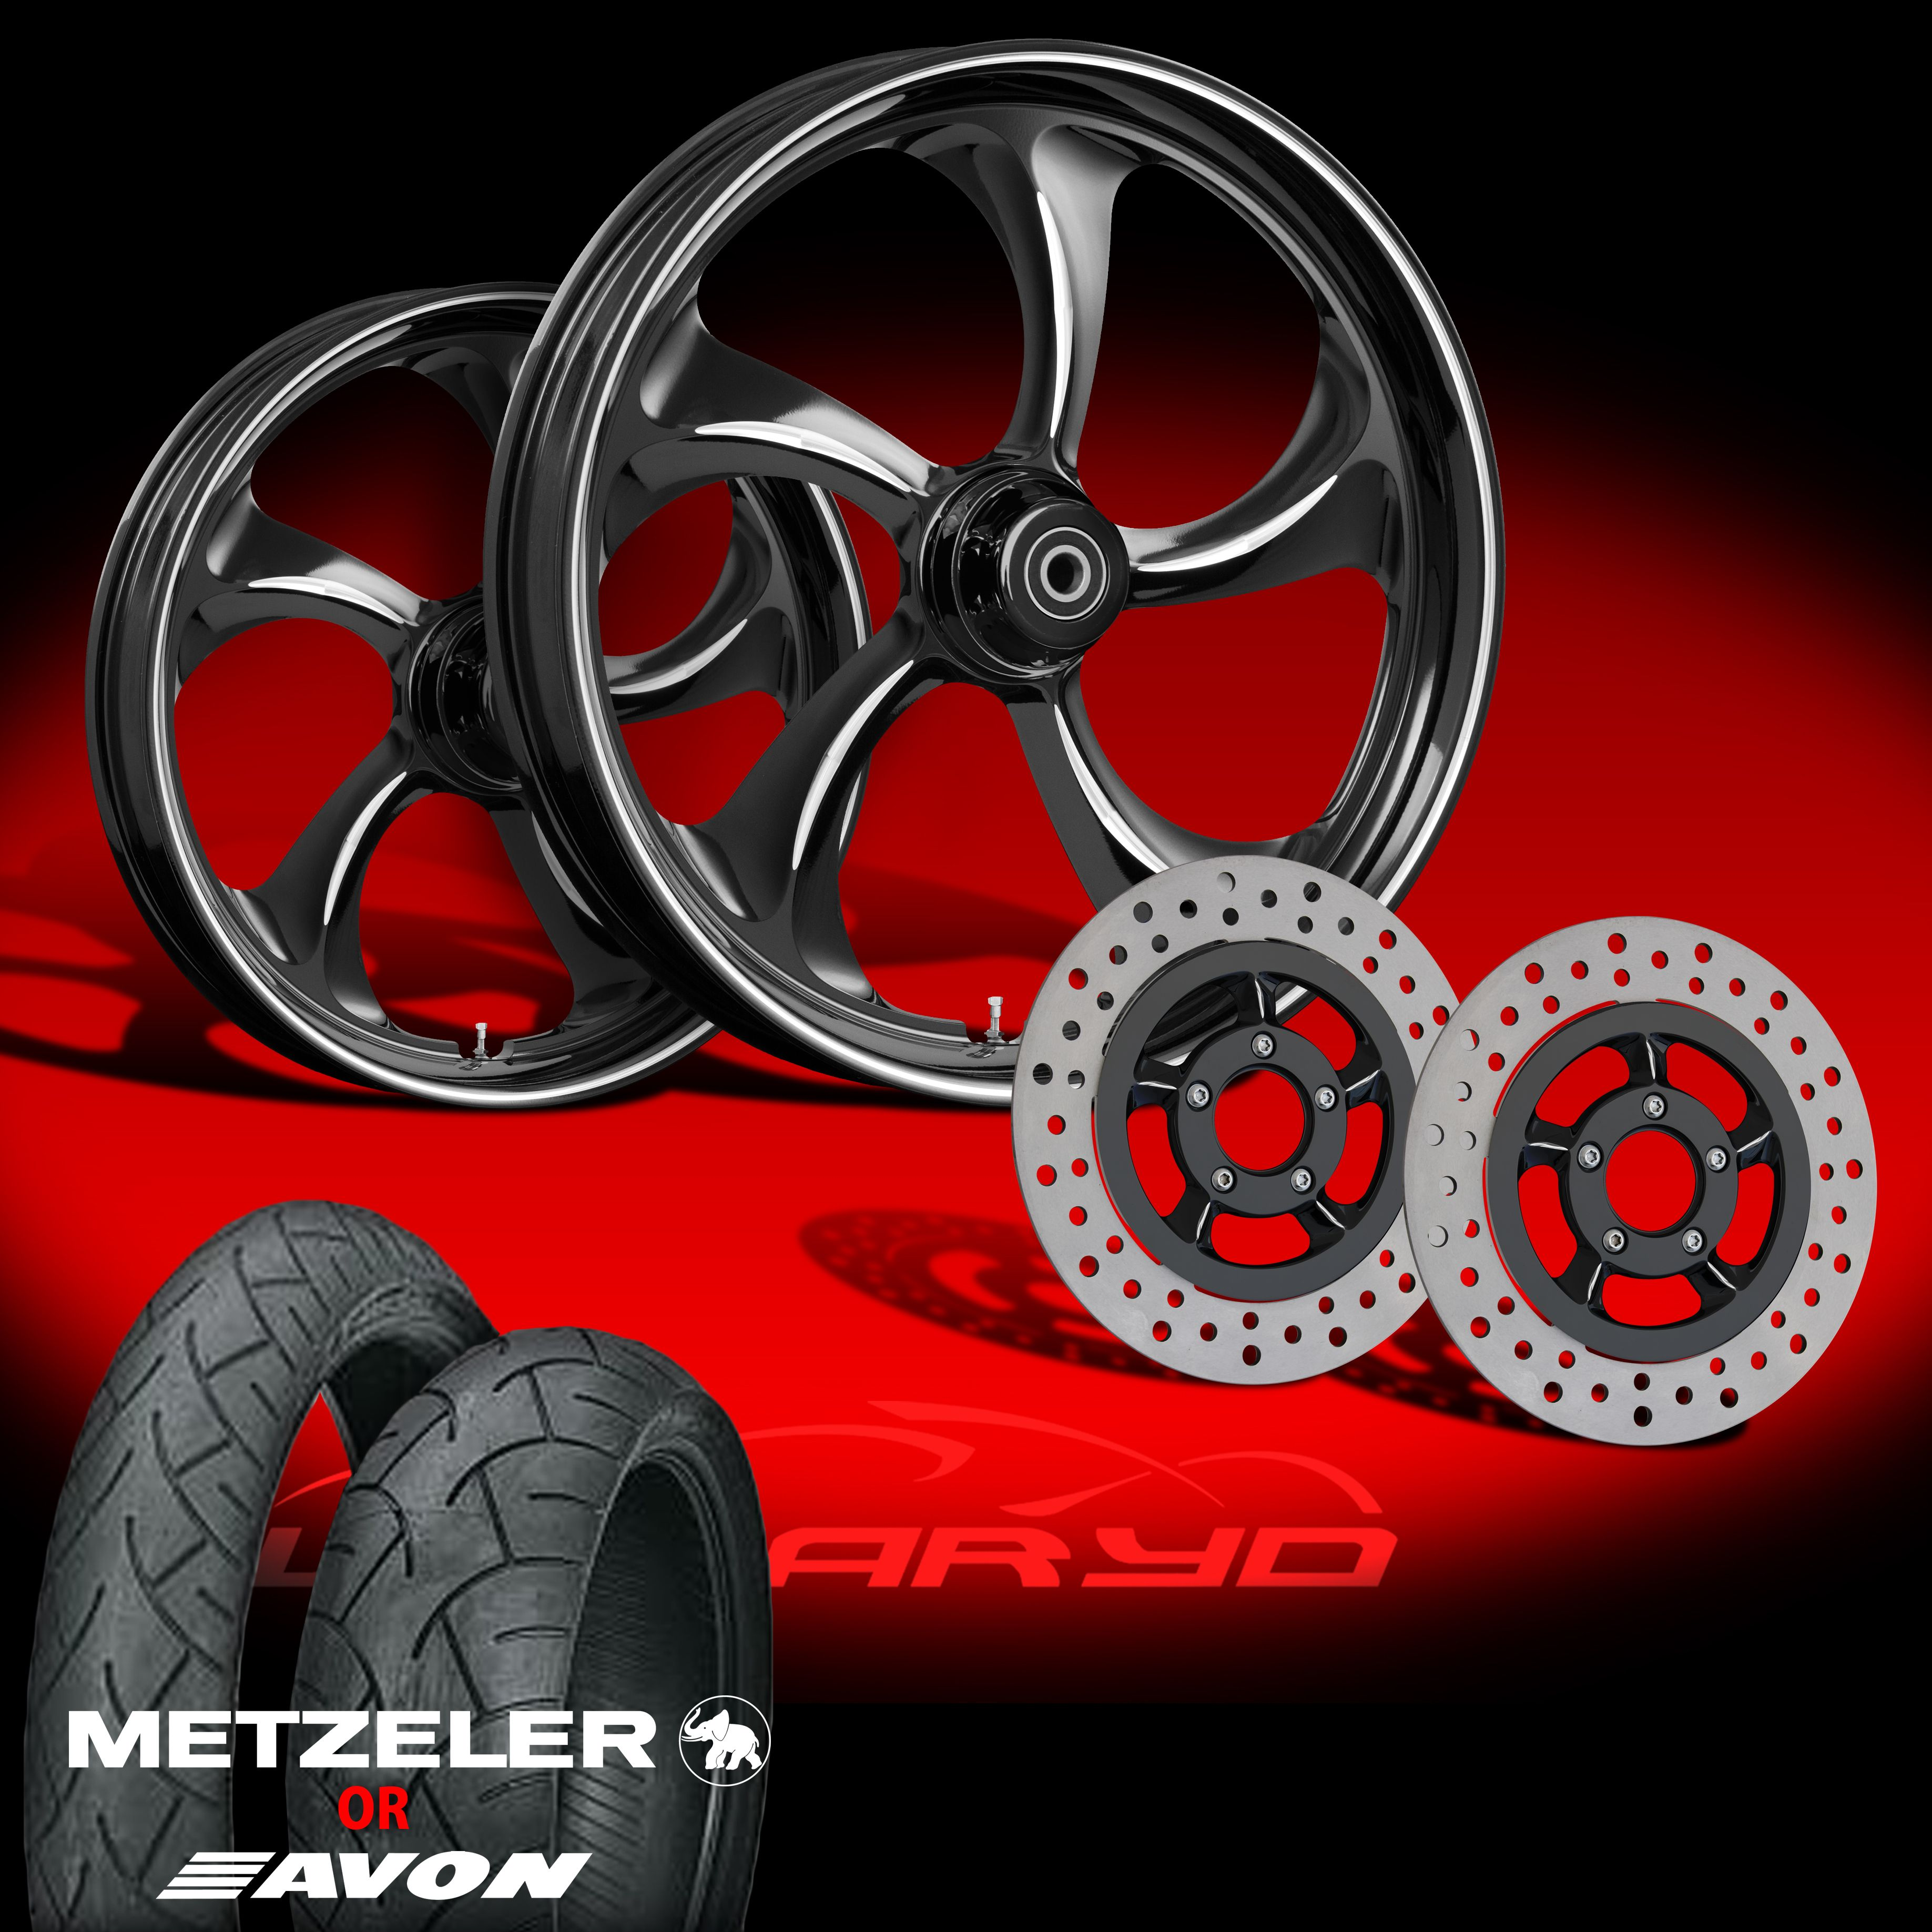 Wanaryd Rollin Black 21 Wheels Tires Dual Rotors for 2000 08 Harley